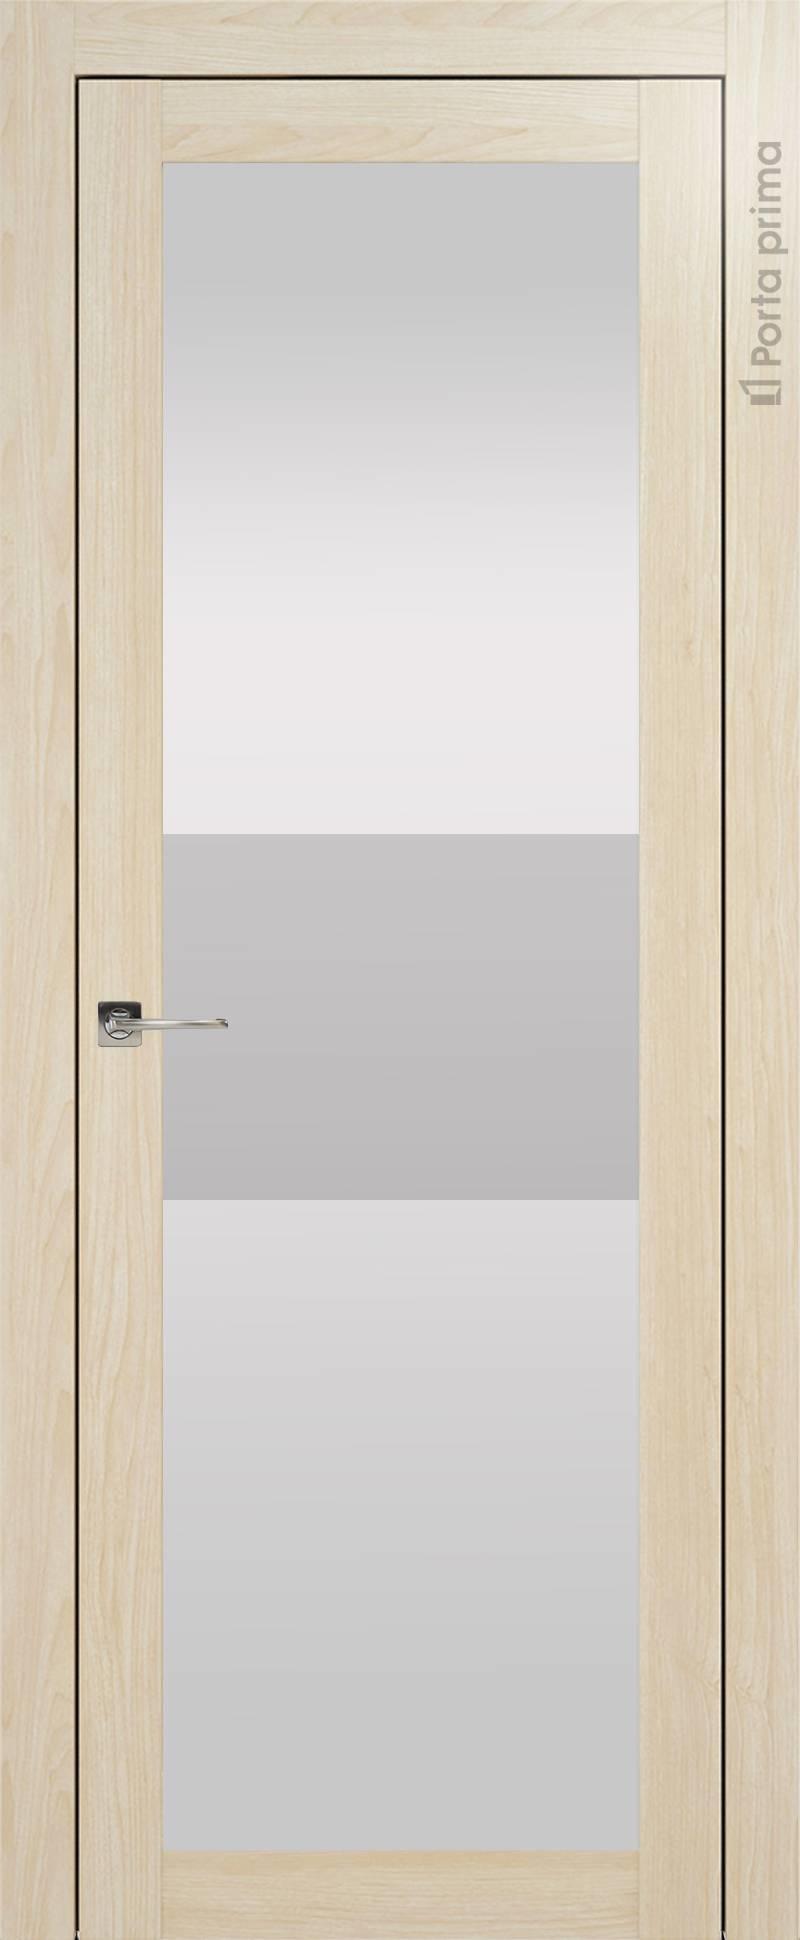 Tivoli З-4 цвет - Клен Со стеклом (ДО)